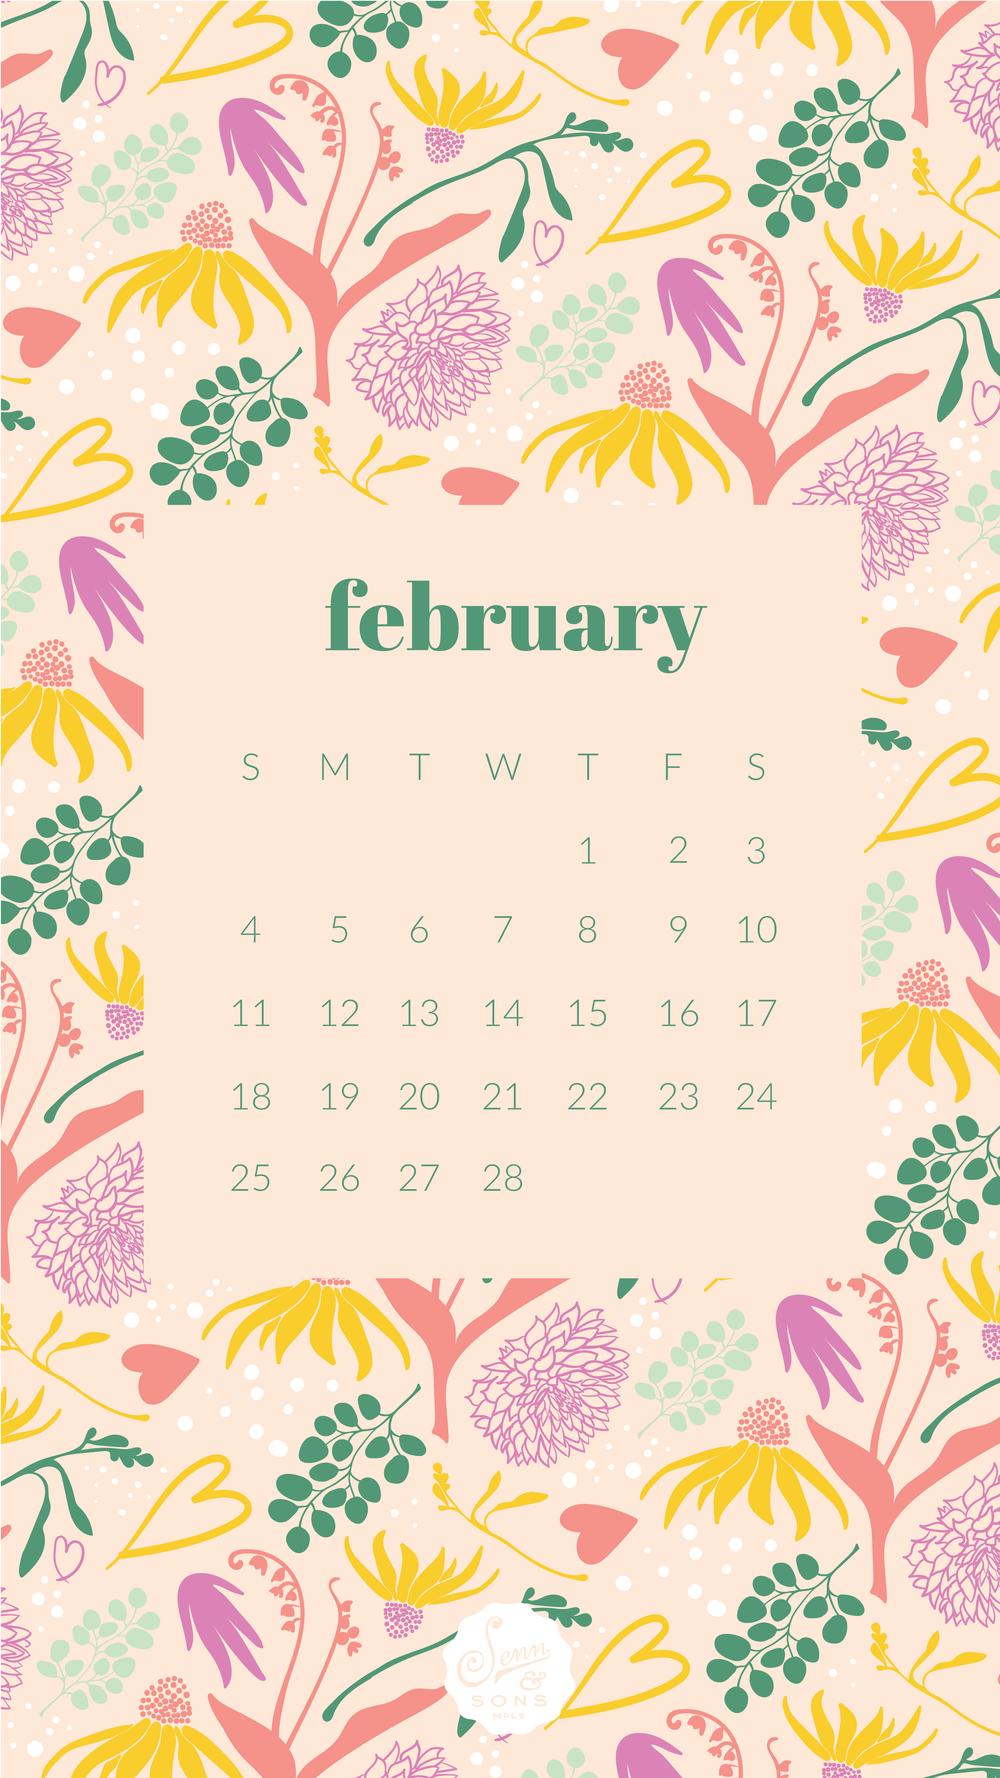 February 2018 Smartphone Calendar.png